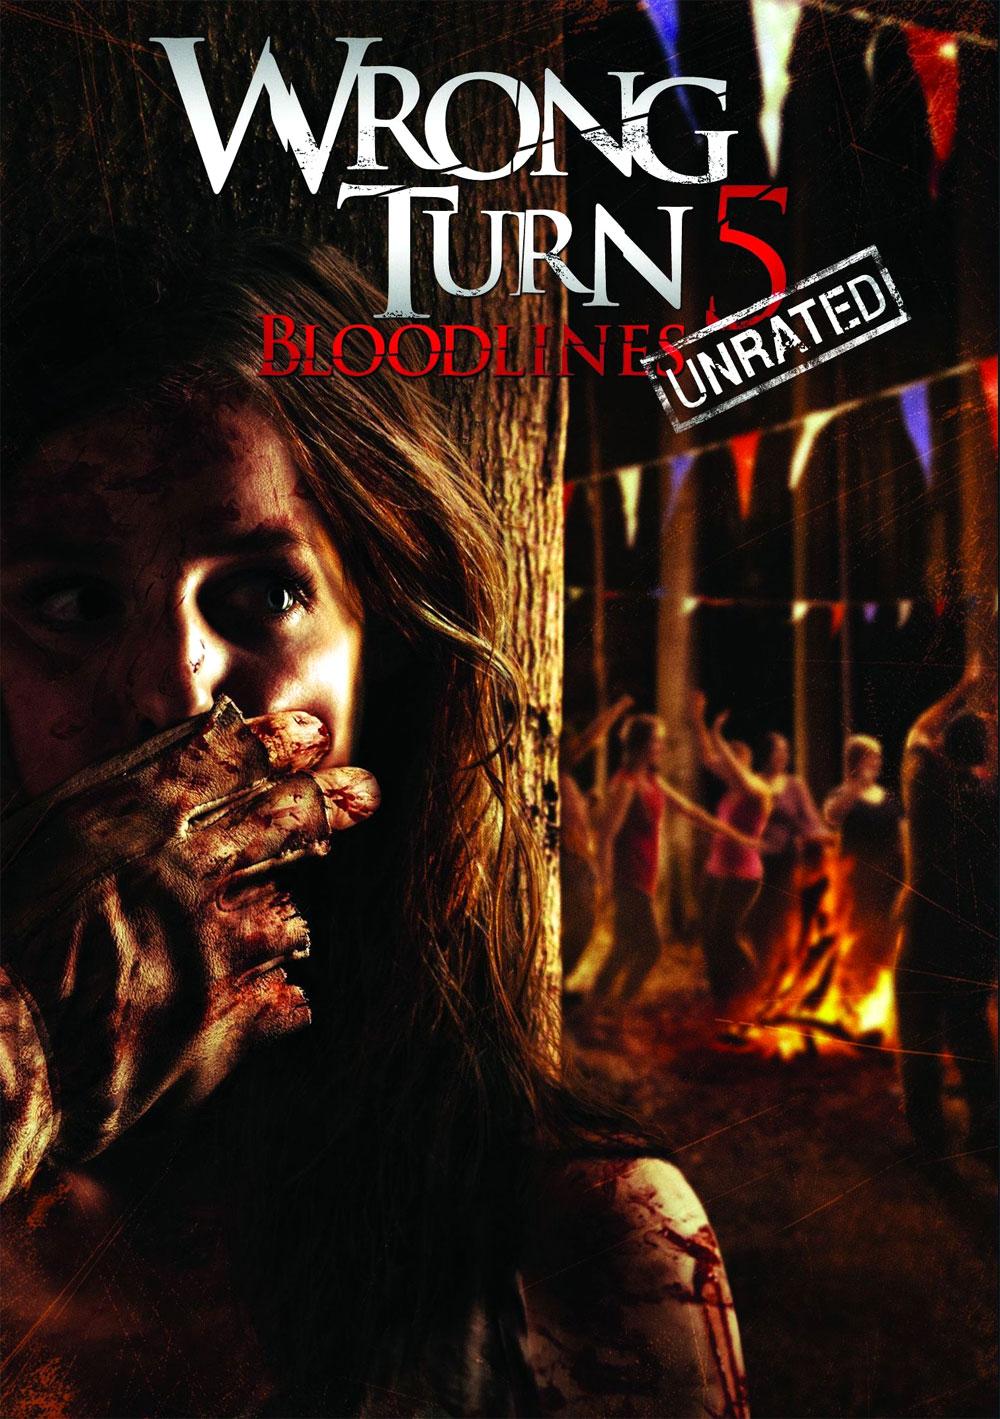 Wrong turn 5 bagno di sangue locandina del film codice 2386 - Bagno di sangue ...